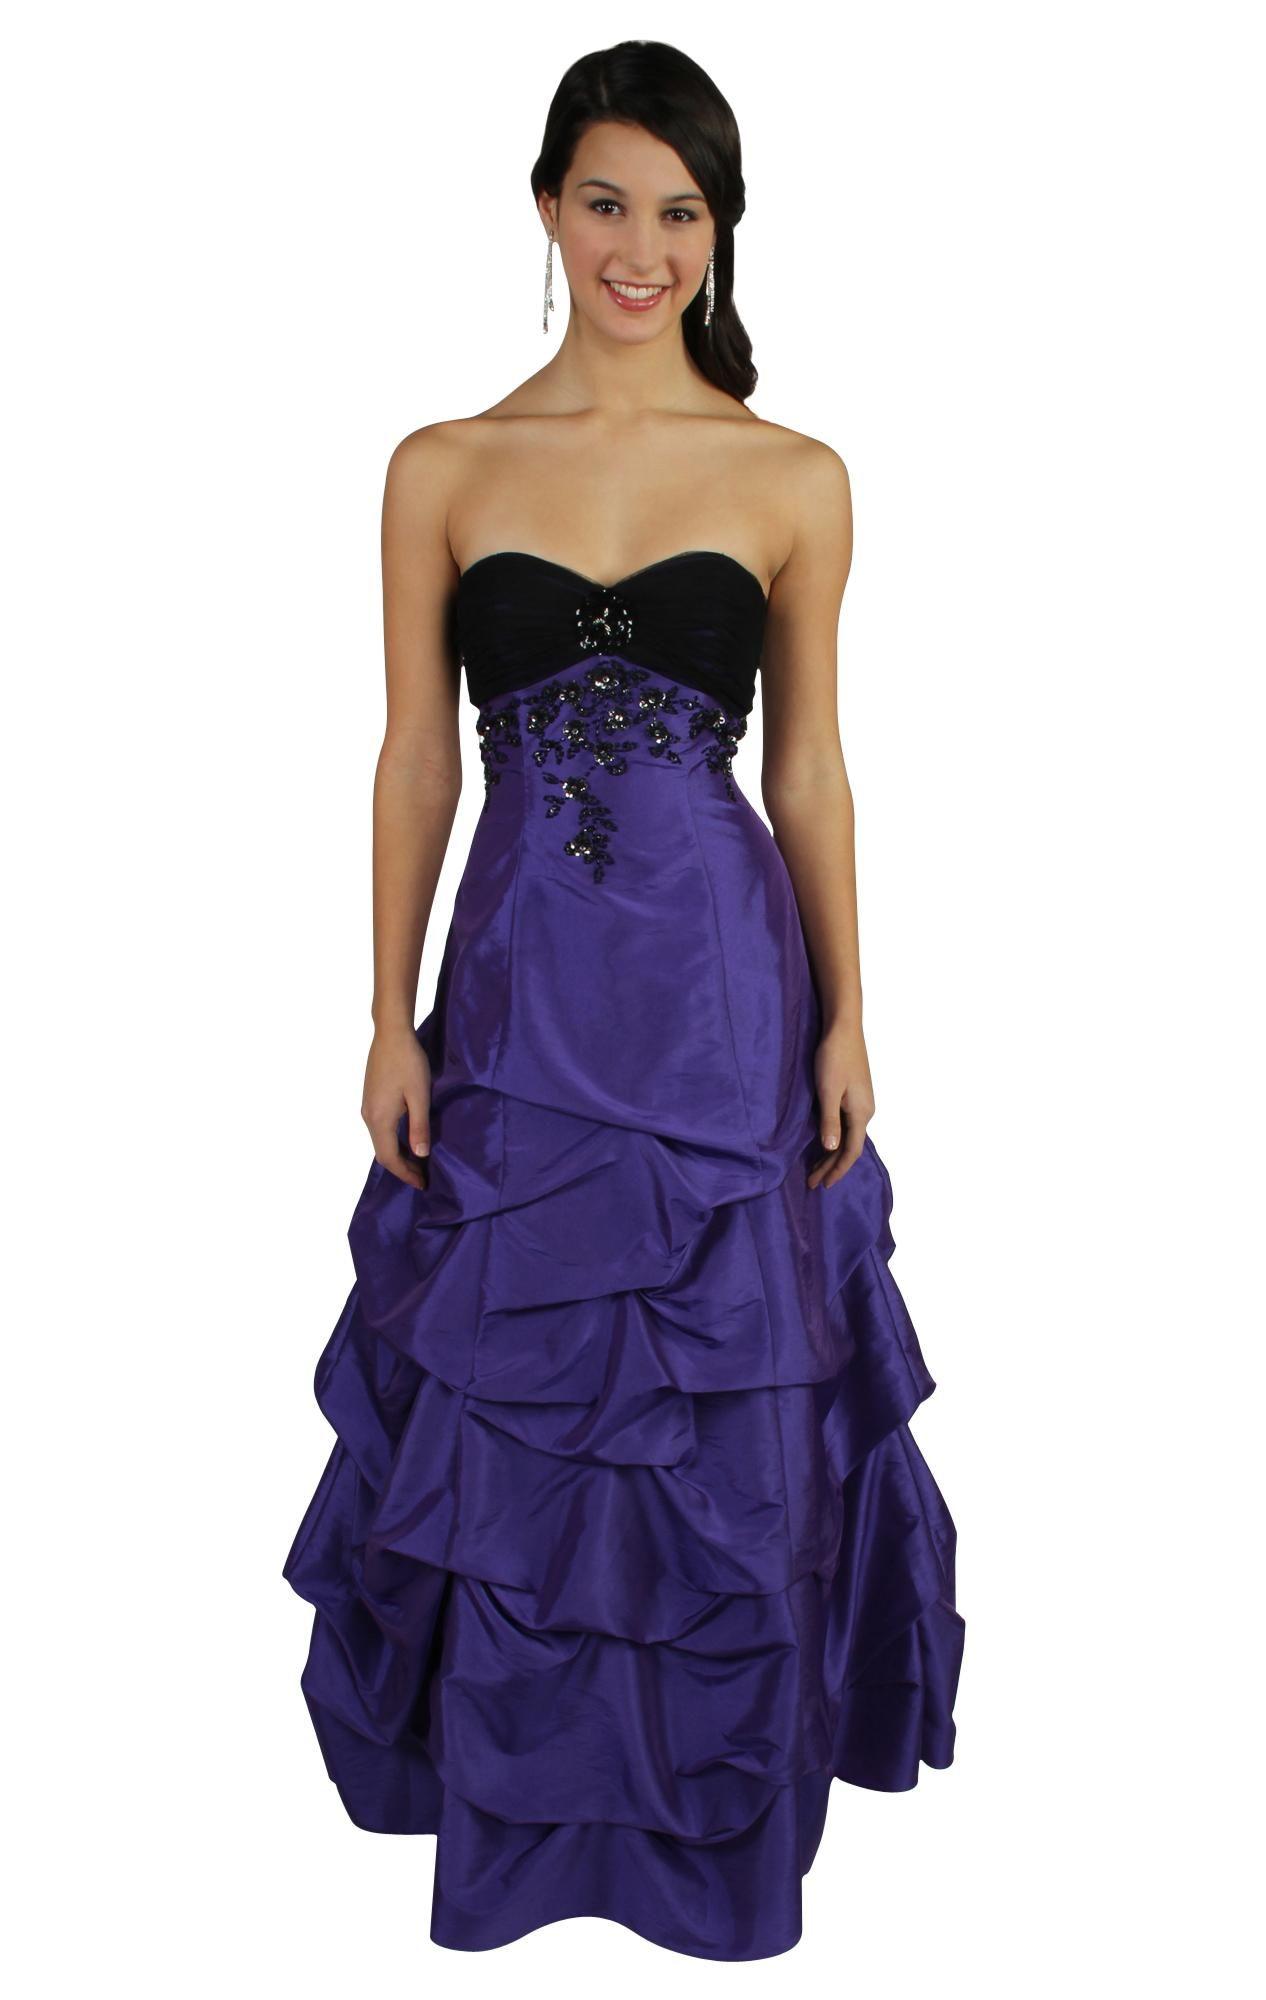 My Sweet 16 Masquerade Ball dress! :D | Ideas for Ashleigh\'s Sweet ...